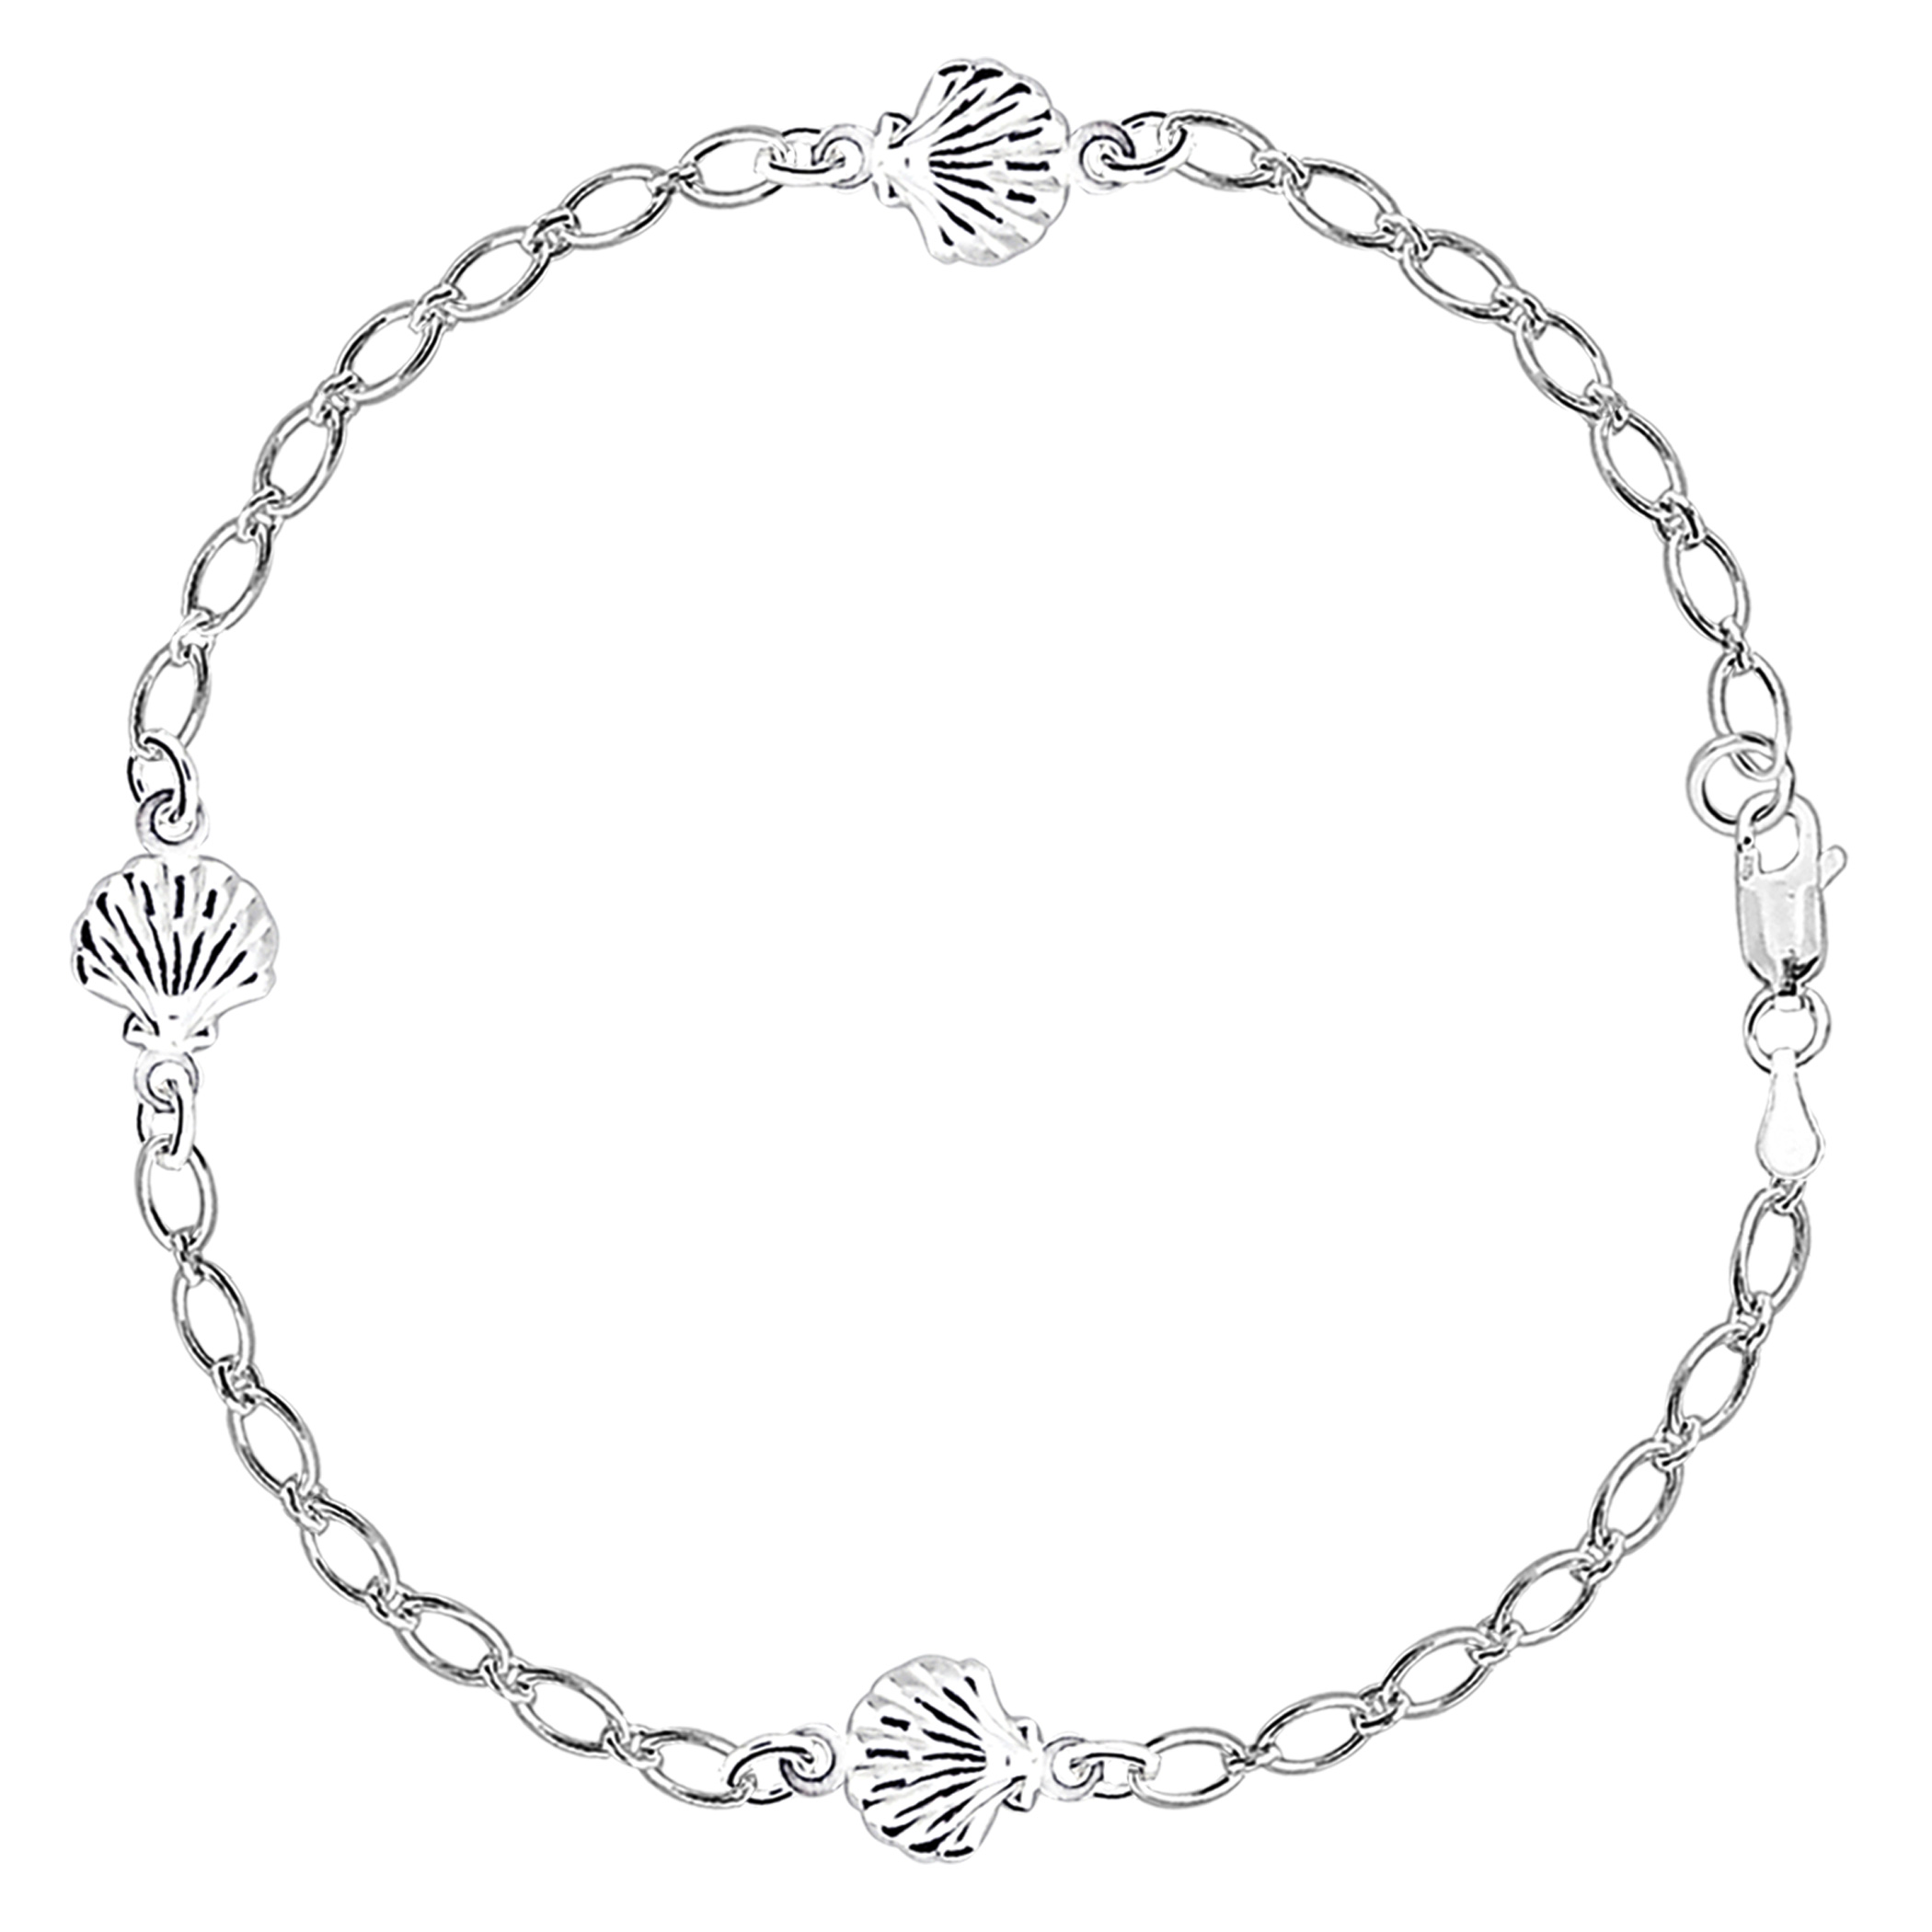 Sea Shell Fancy Chain Anklet In Sterling Silver, 10″